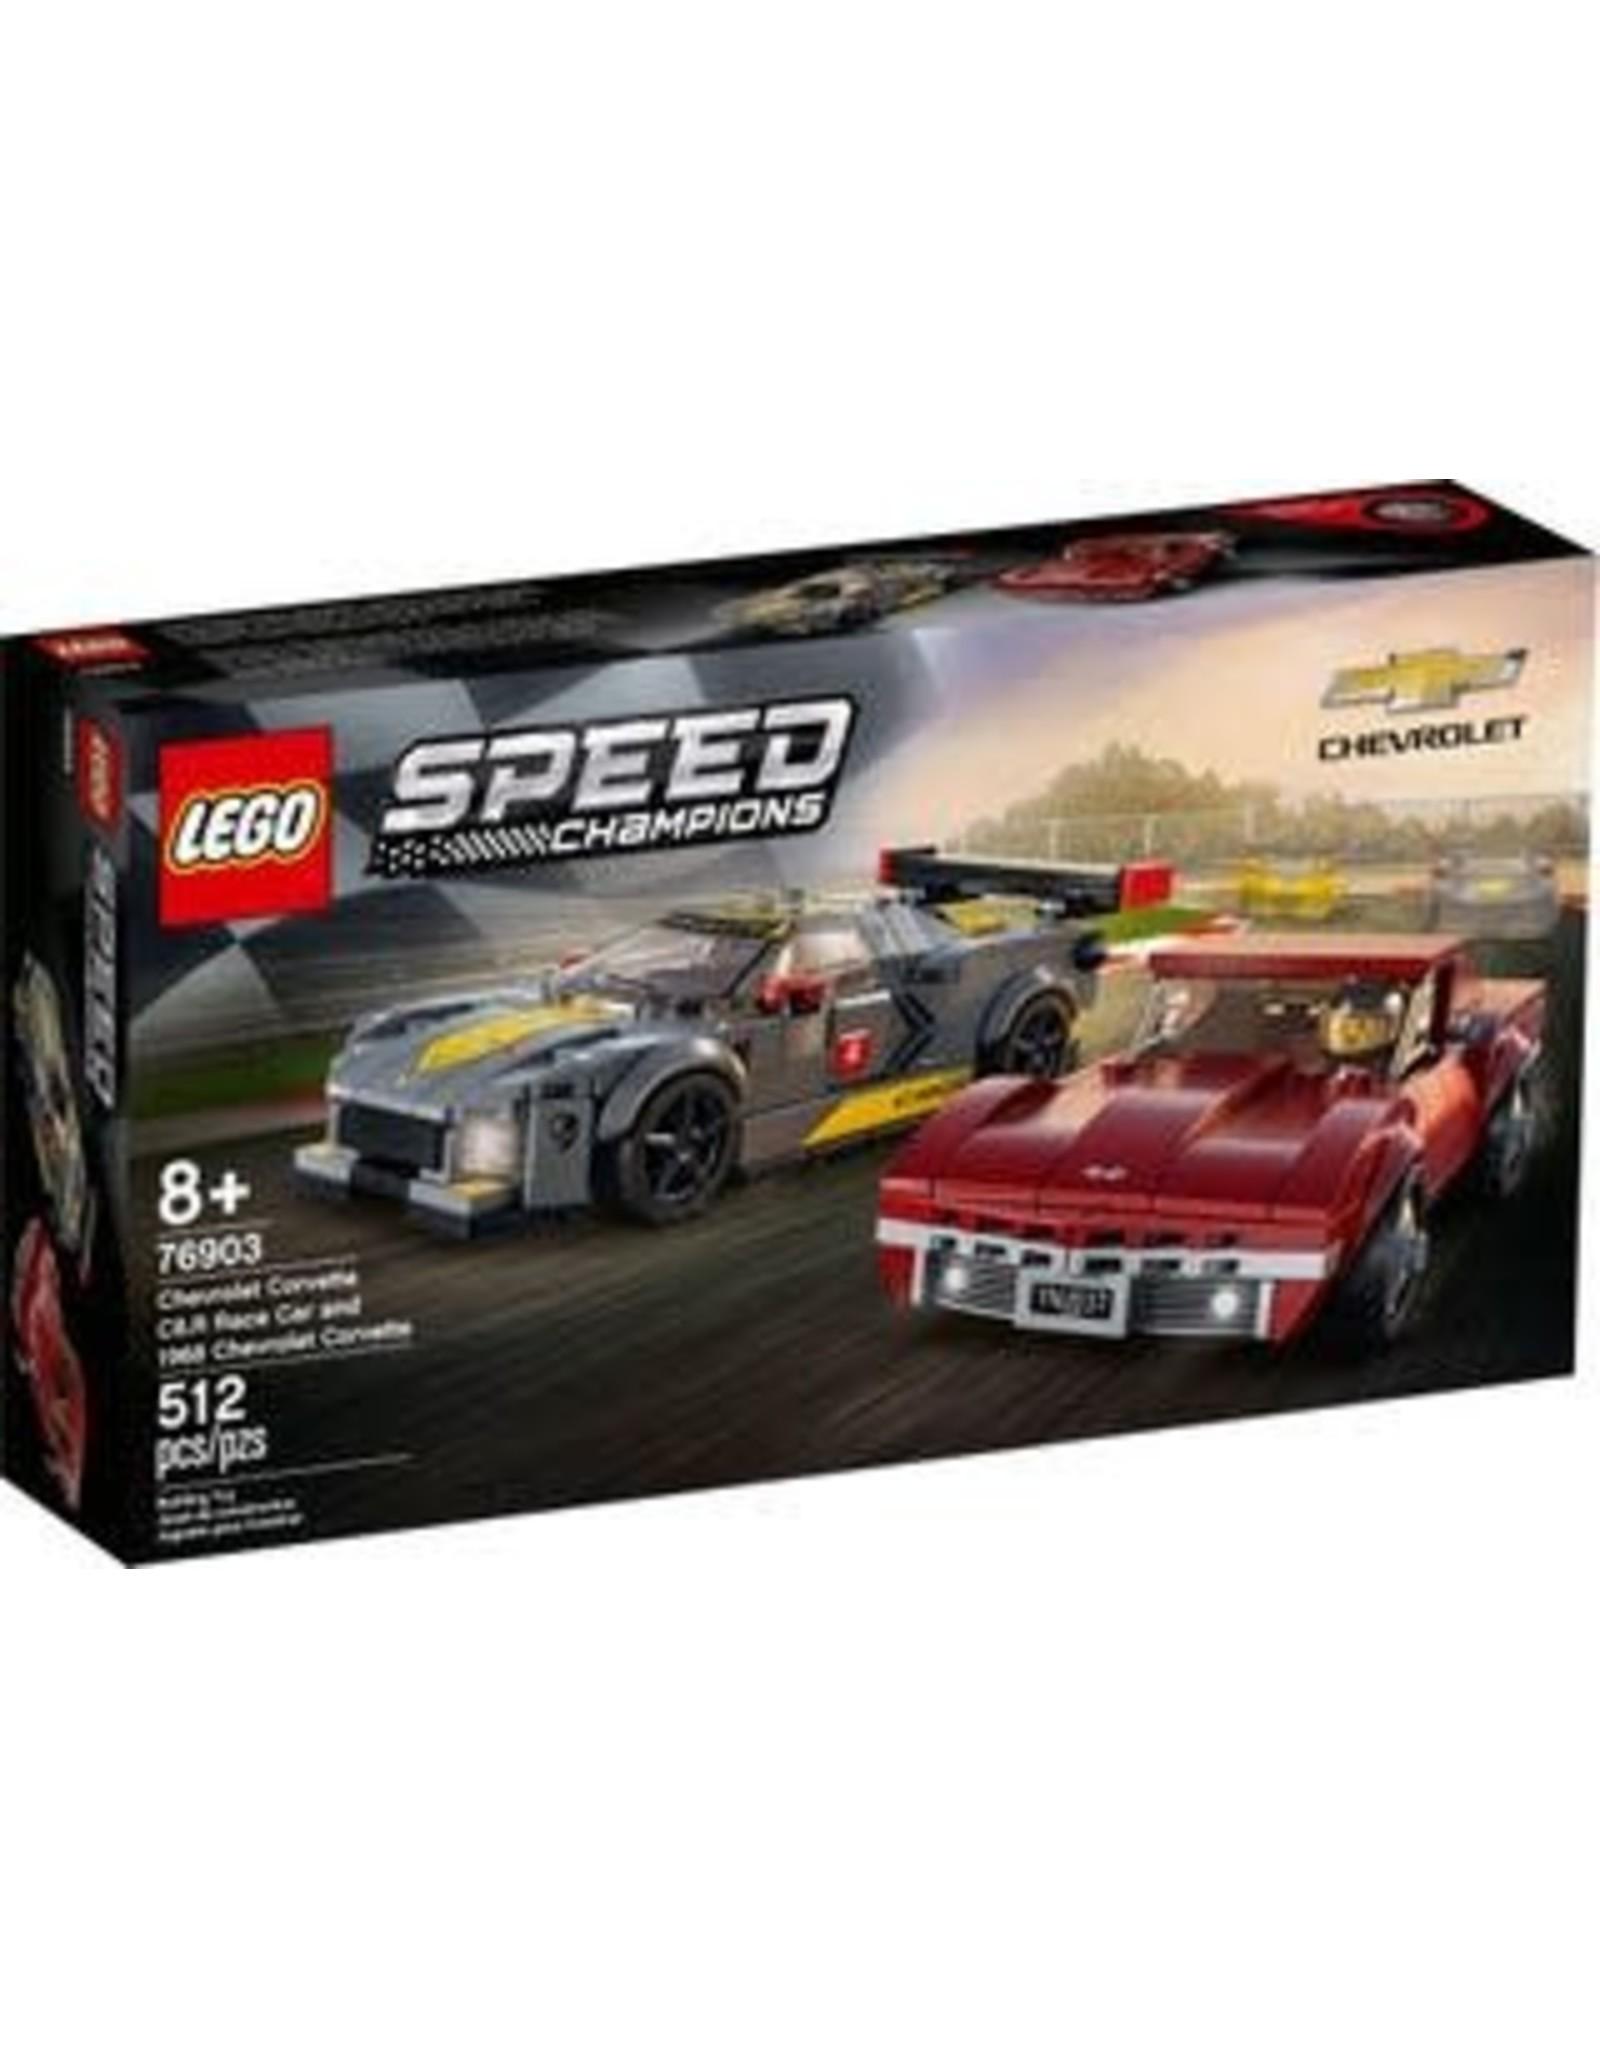 Lego Chevrolet Corvette C8.R Race Car and 1968 Chevrolet Corvette